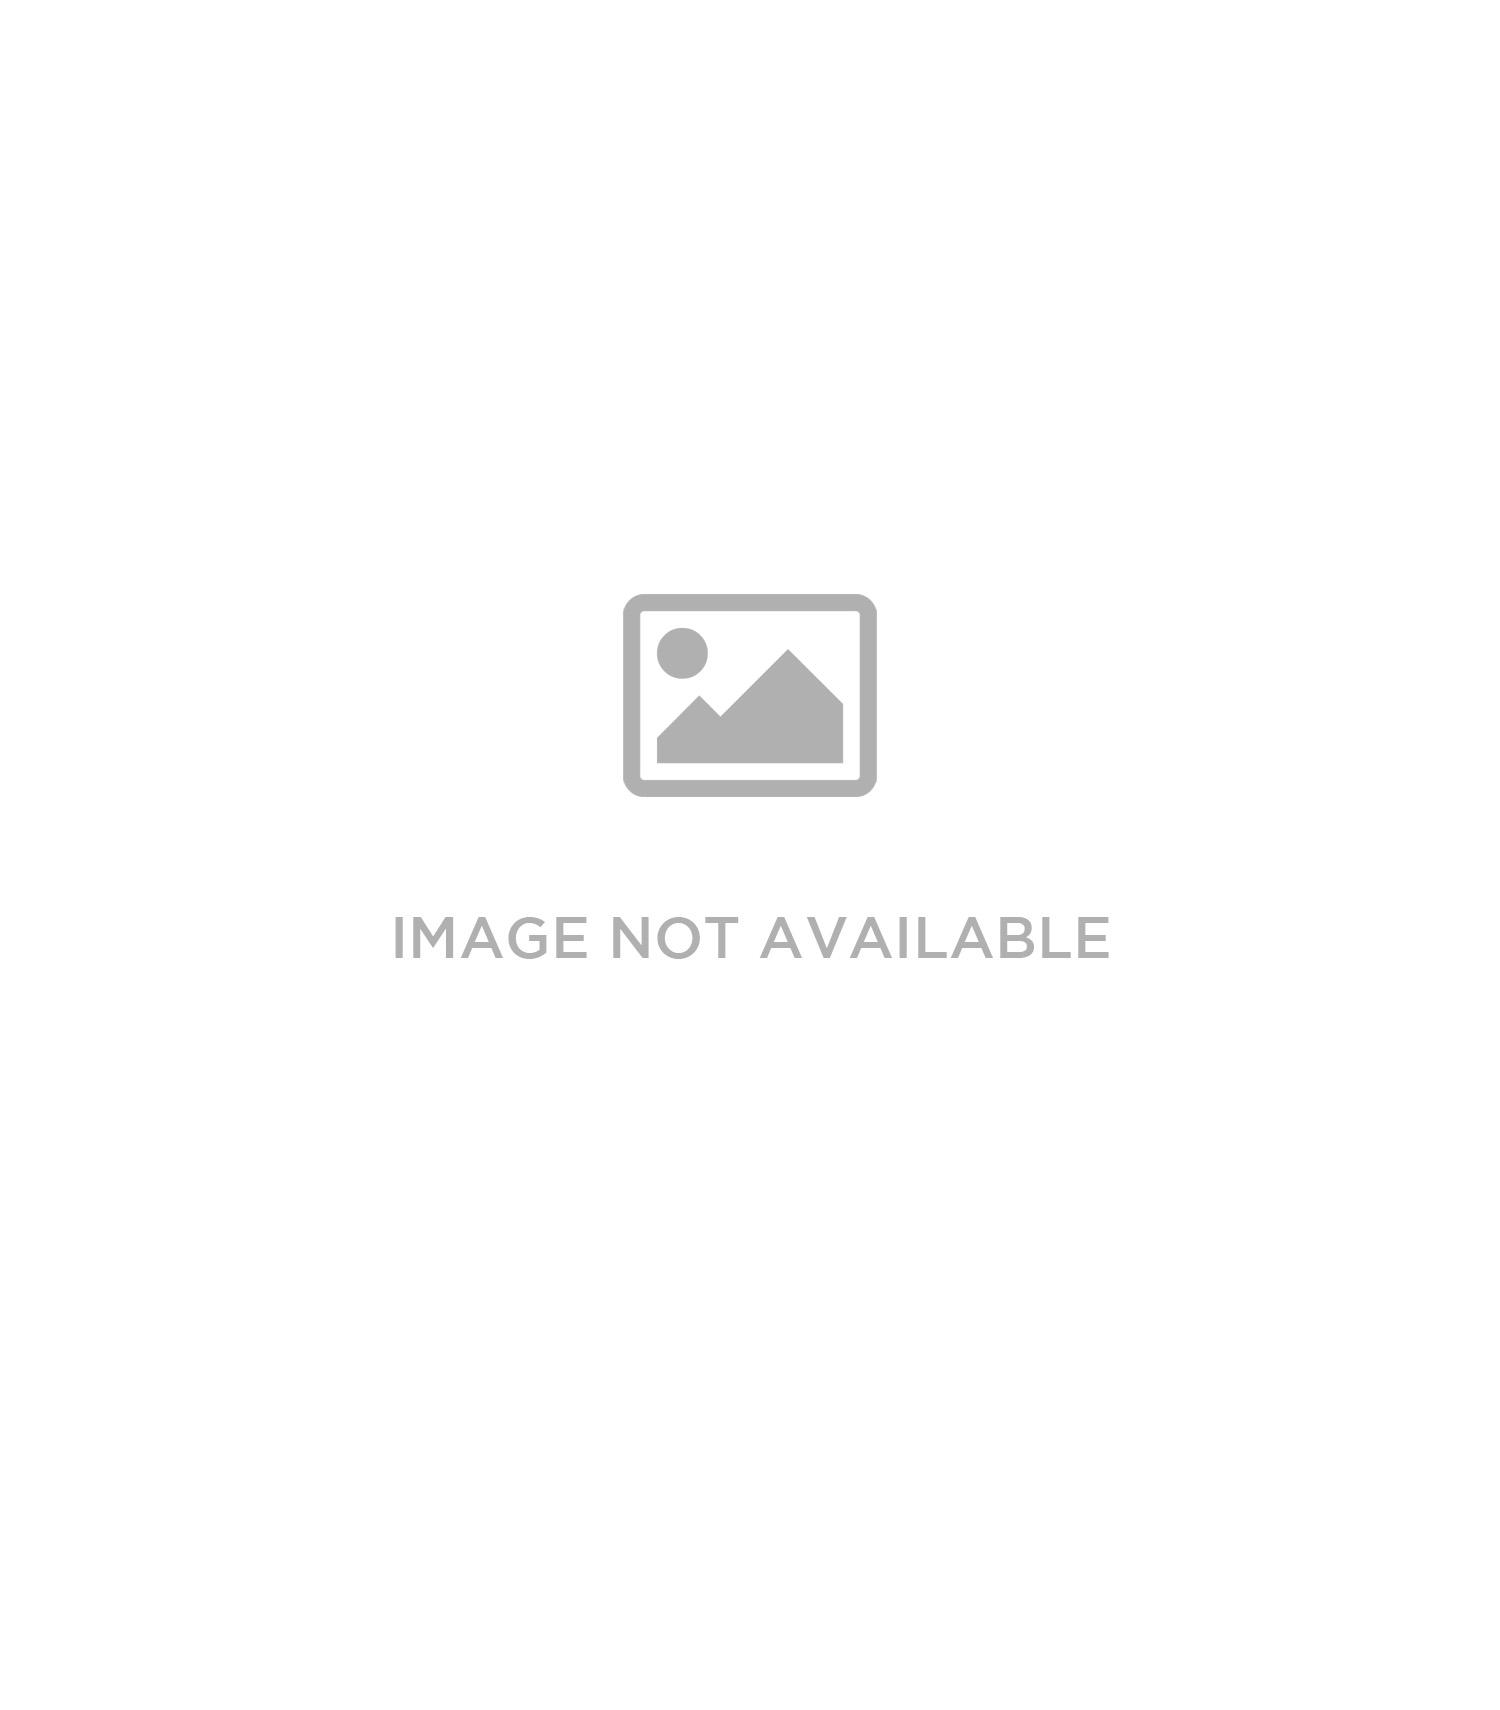 be5dc558 GILDAN® PREMIUM COTTON™ RING SPUN FLEECE HOODED SWEATSHIRT. 92500